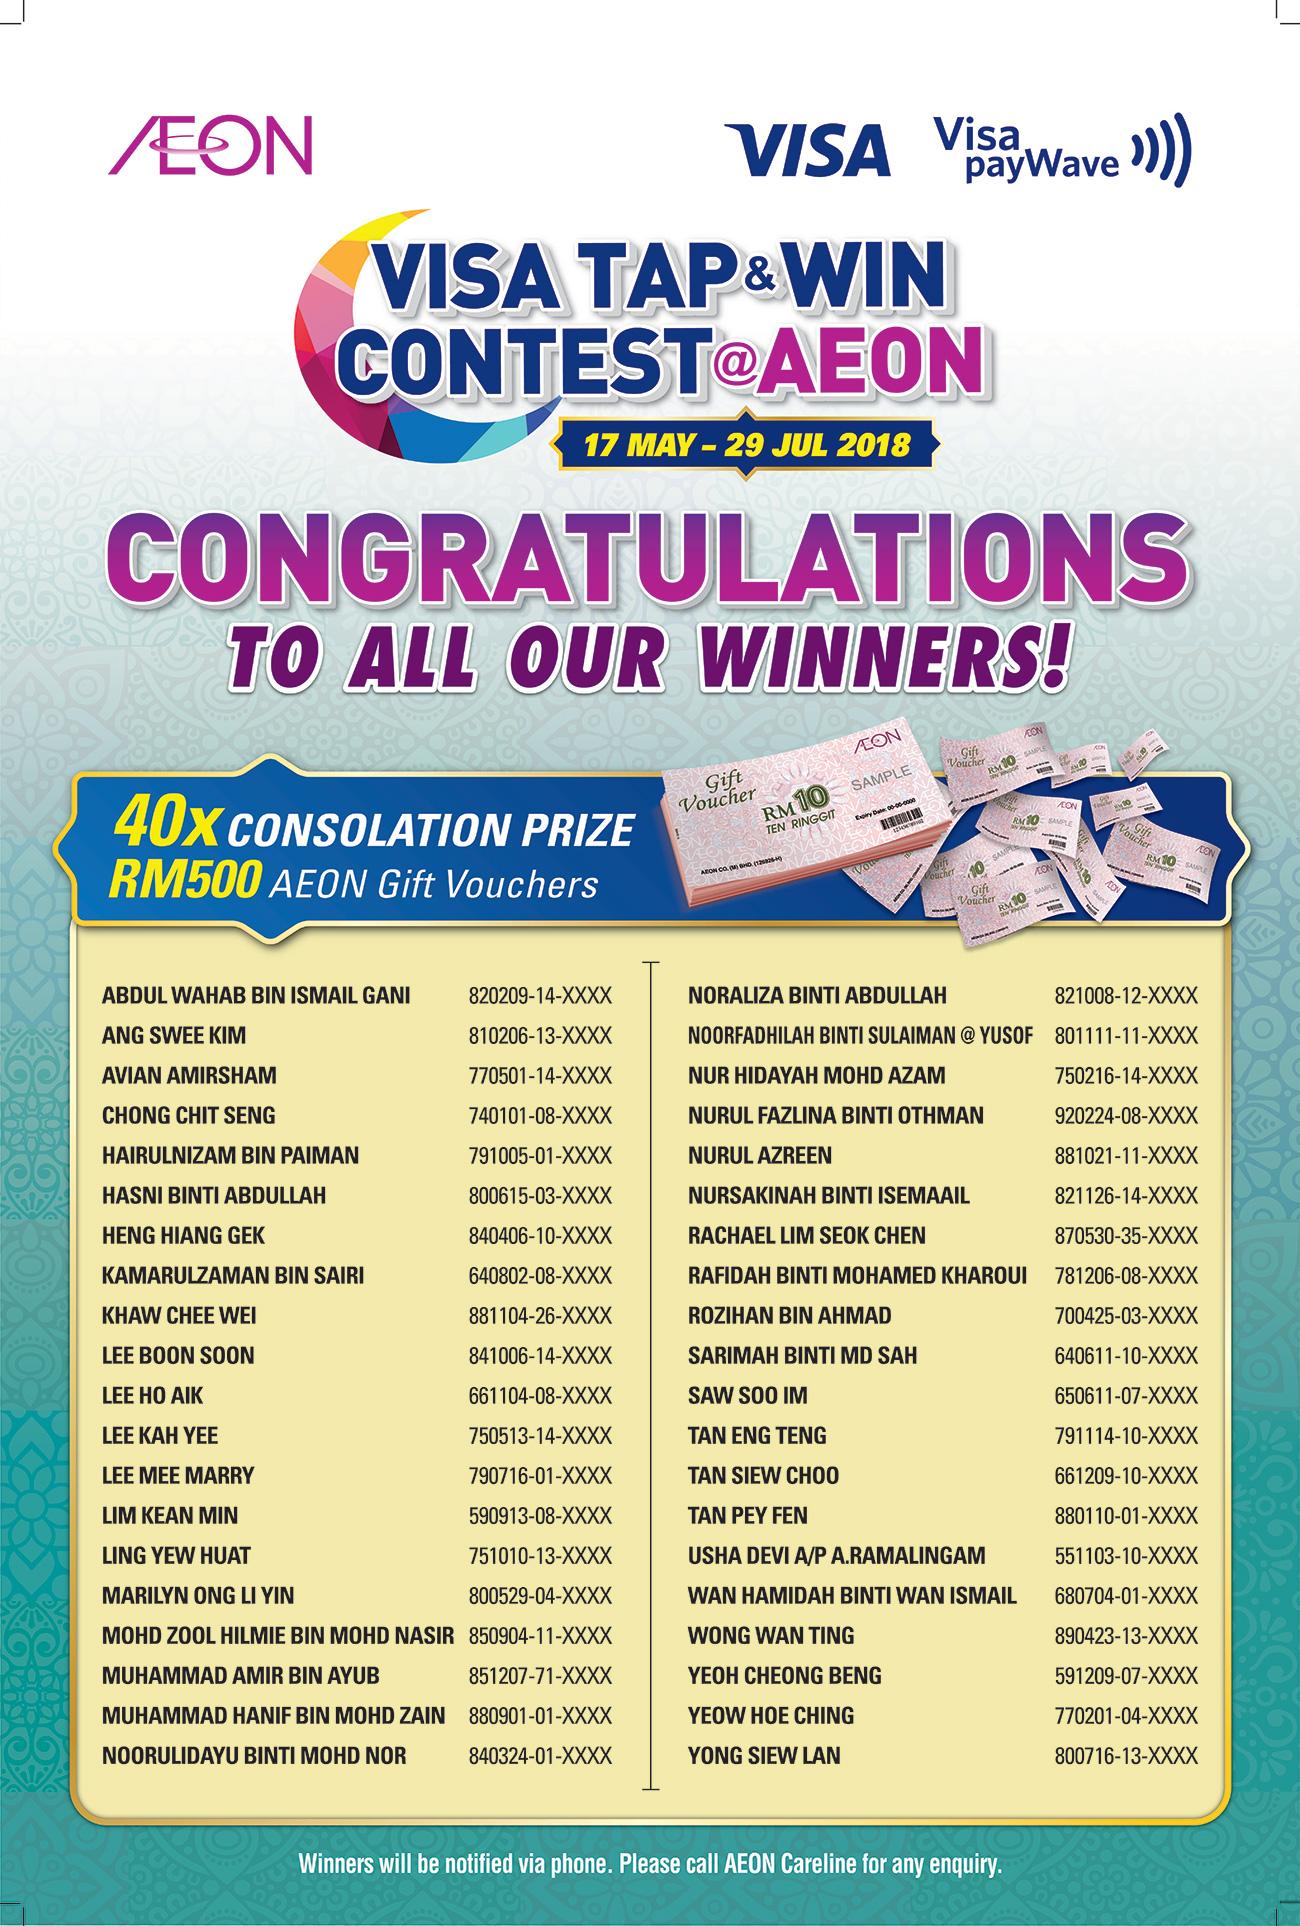 Aeon Jusco Price List Altcoin Exchange Voucher Aon Member Read More